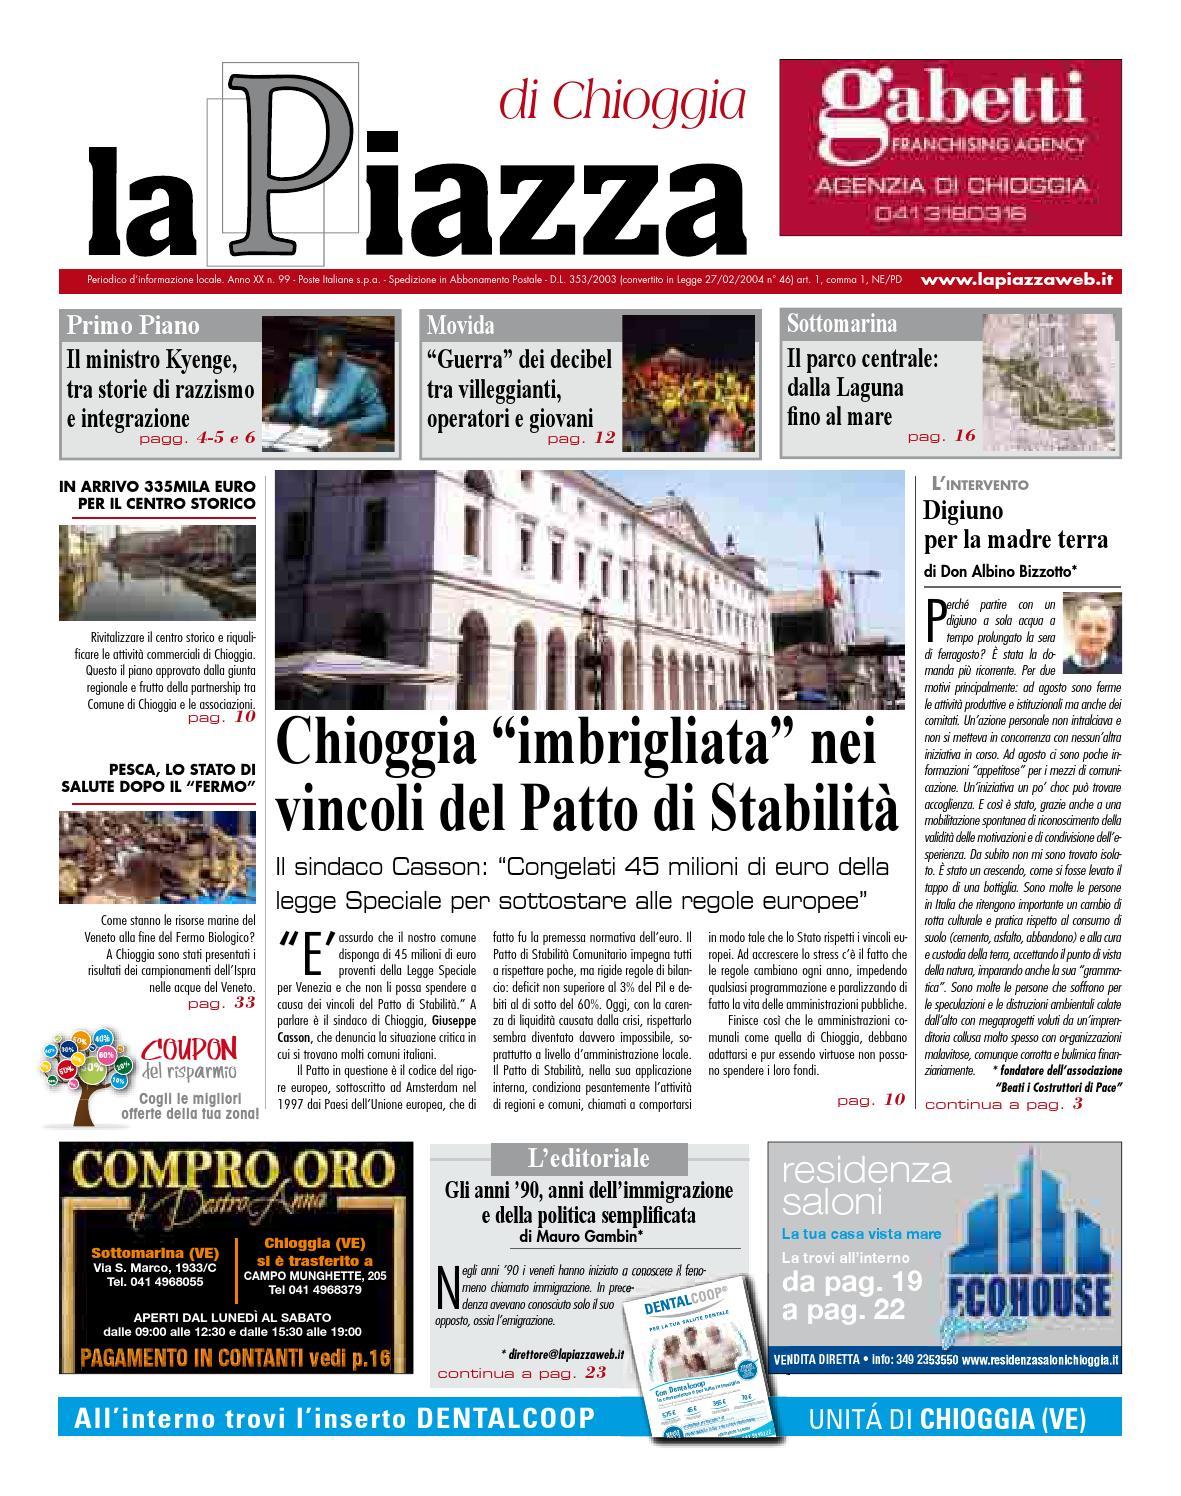 Chioggia ago2013 n99 by lapiazza give emotions - issuu 808ae783eed